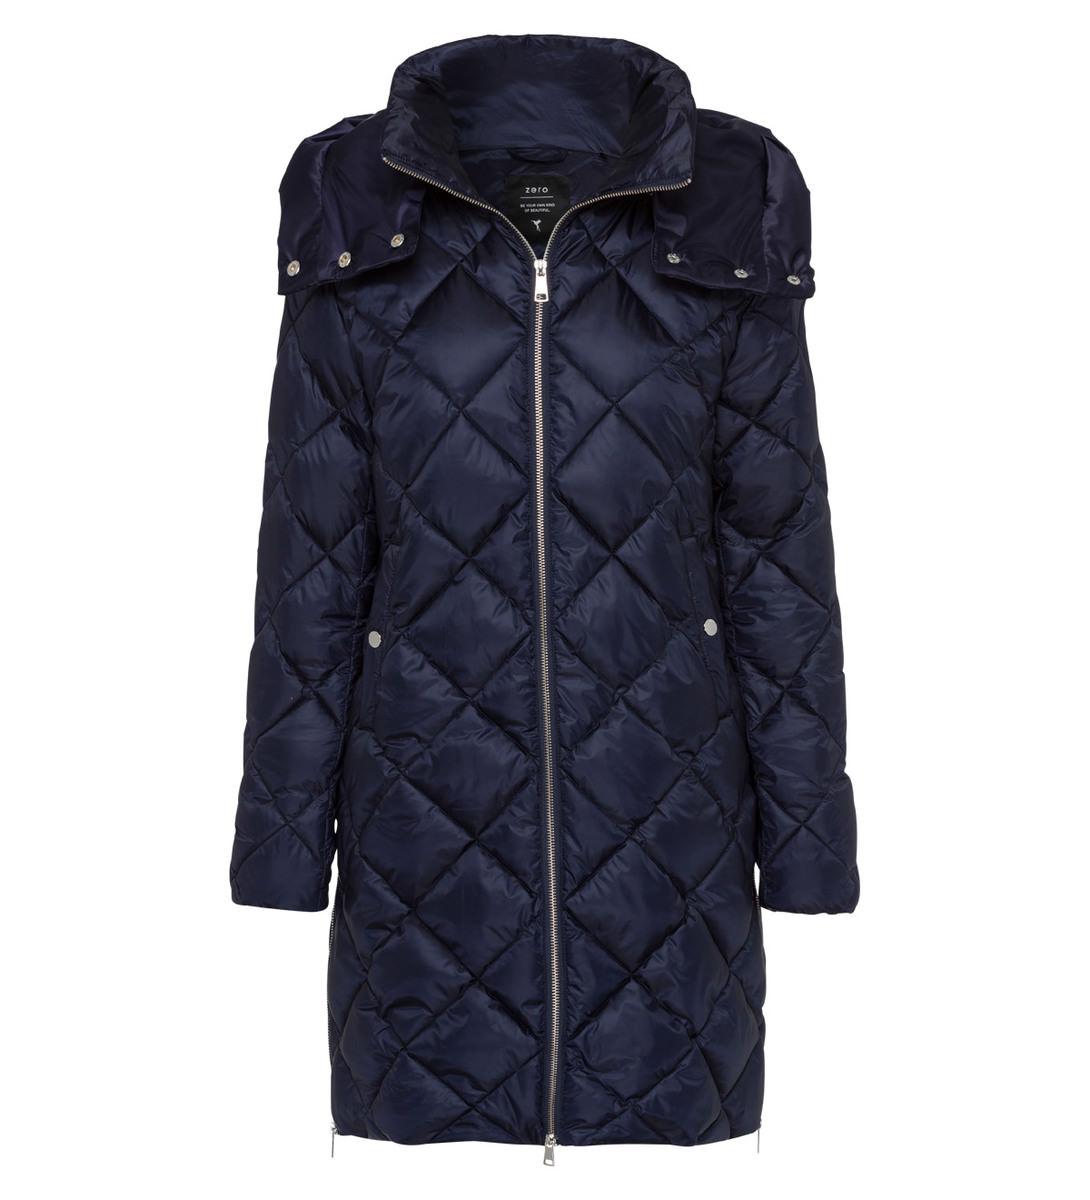 Mantel mit abnehmbarer Kapuze in blue black